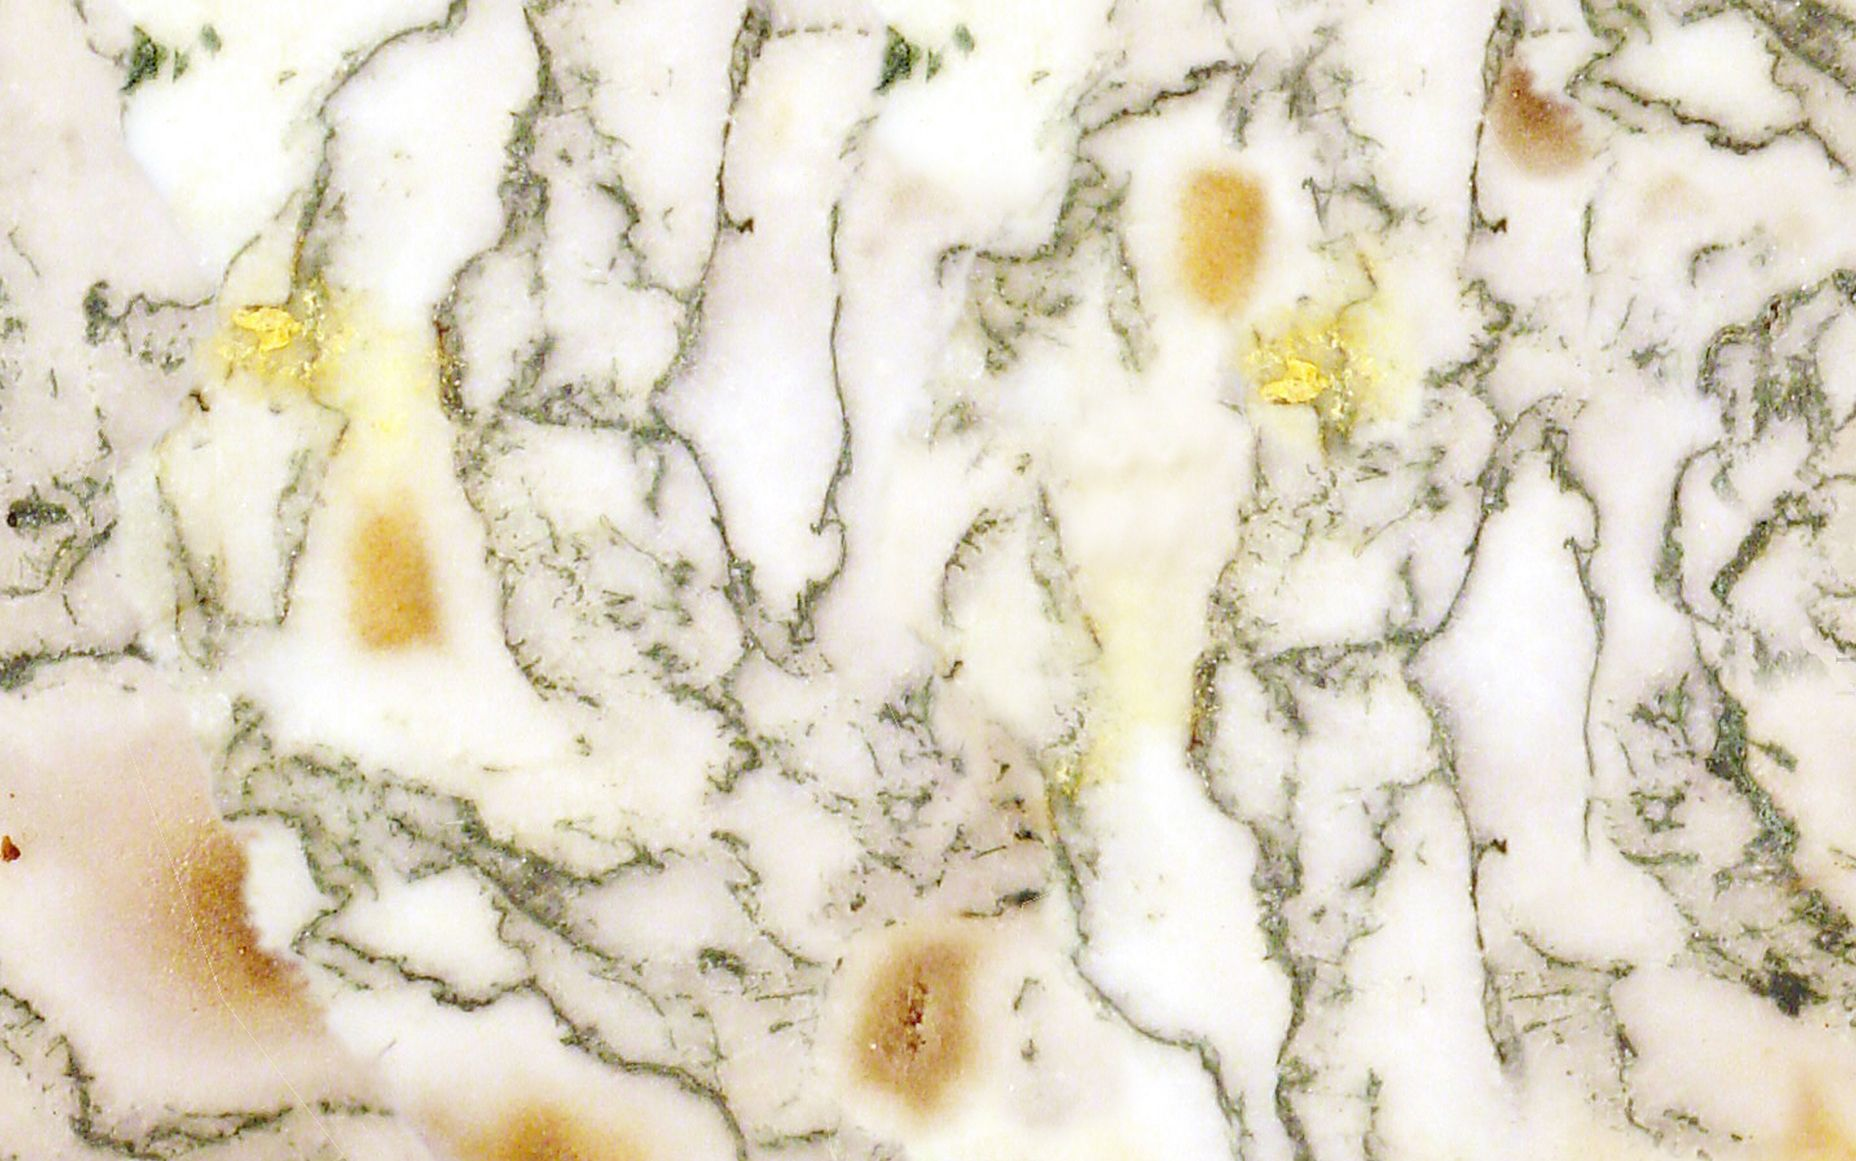 marble desktop wallpaper Marble desktop wallpaper